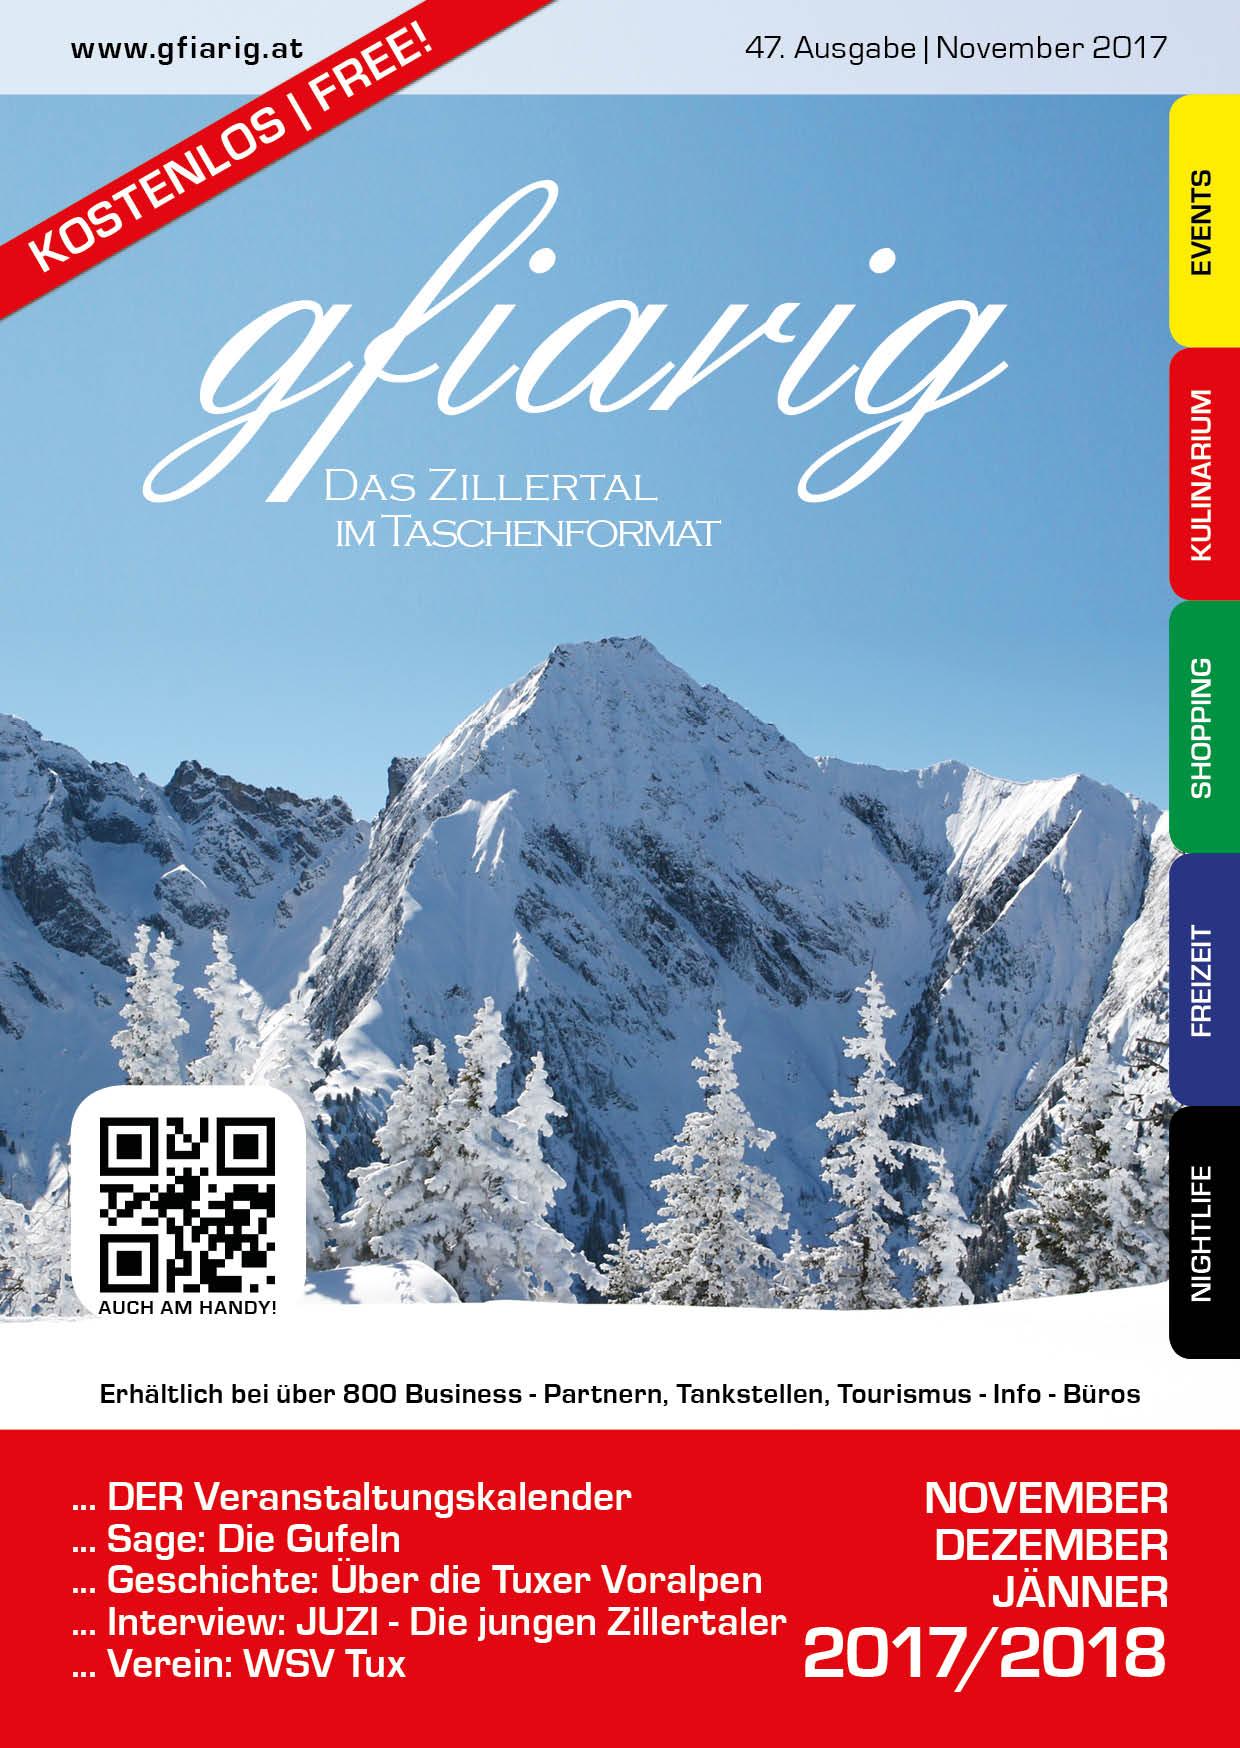 Gfiarig - 47.Ausgabe - November 2017